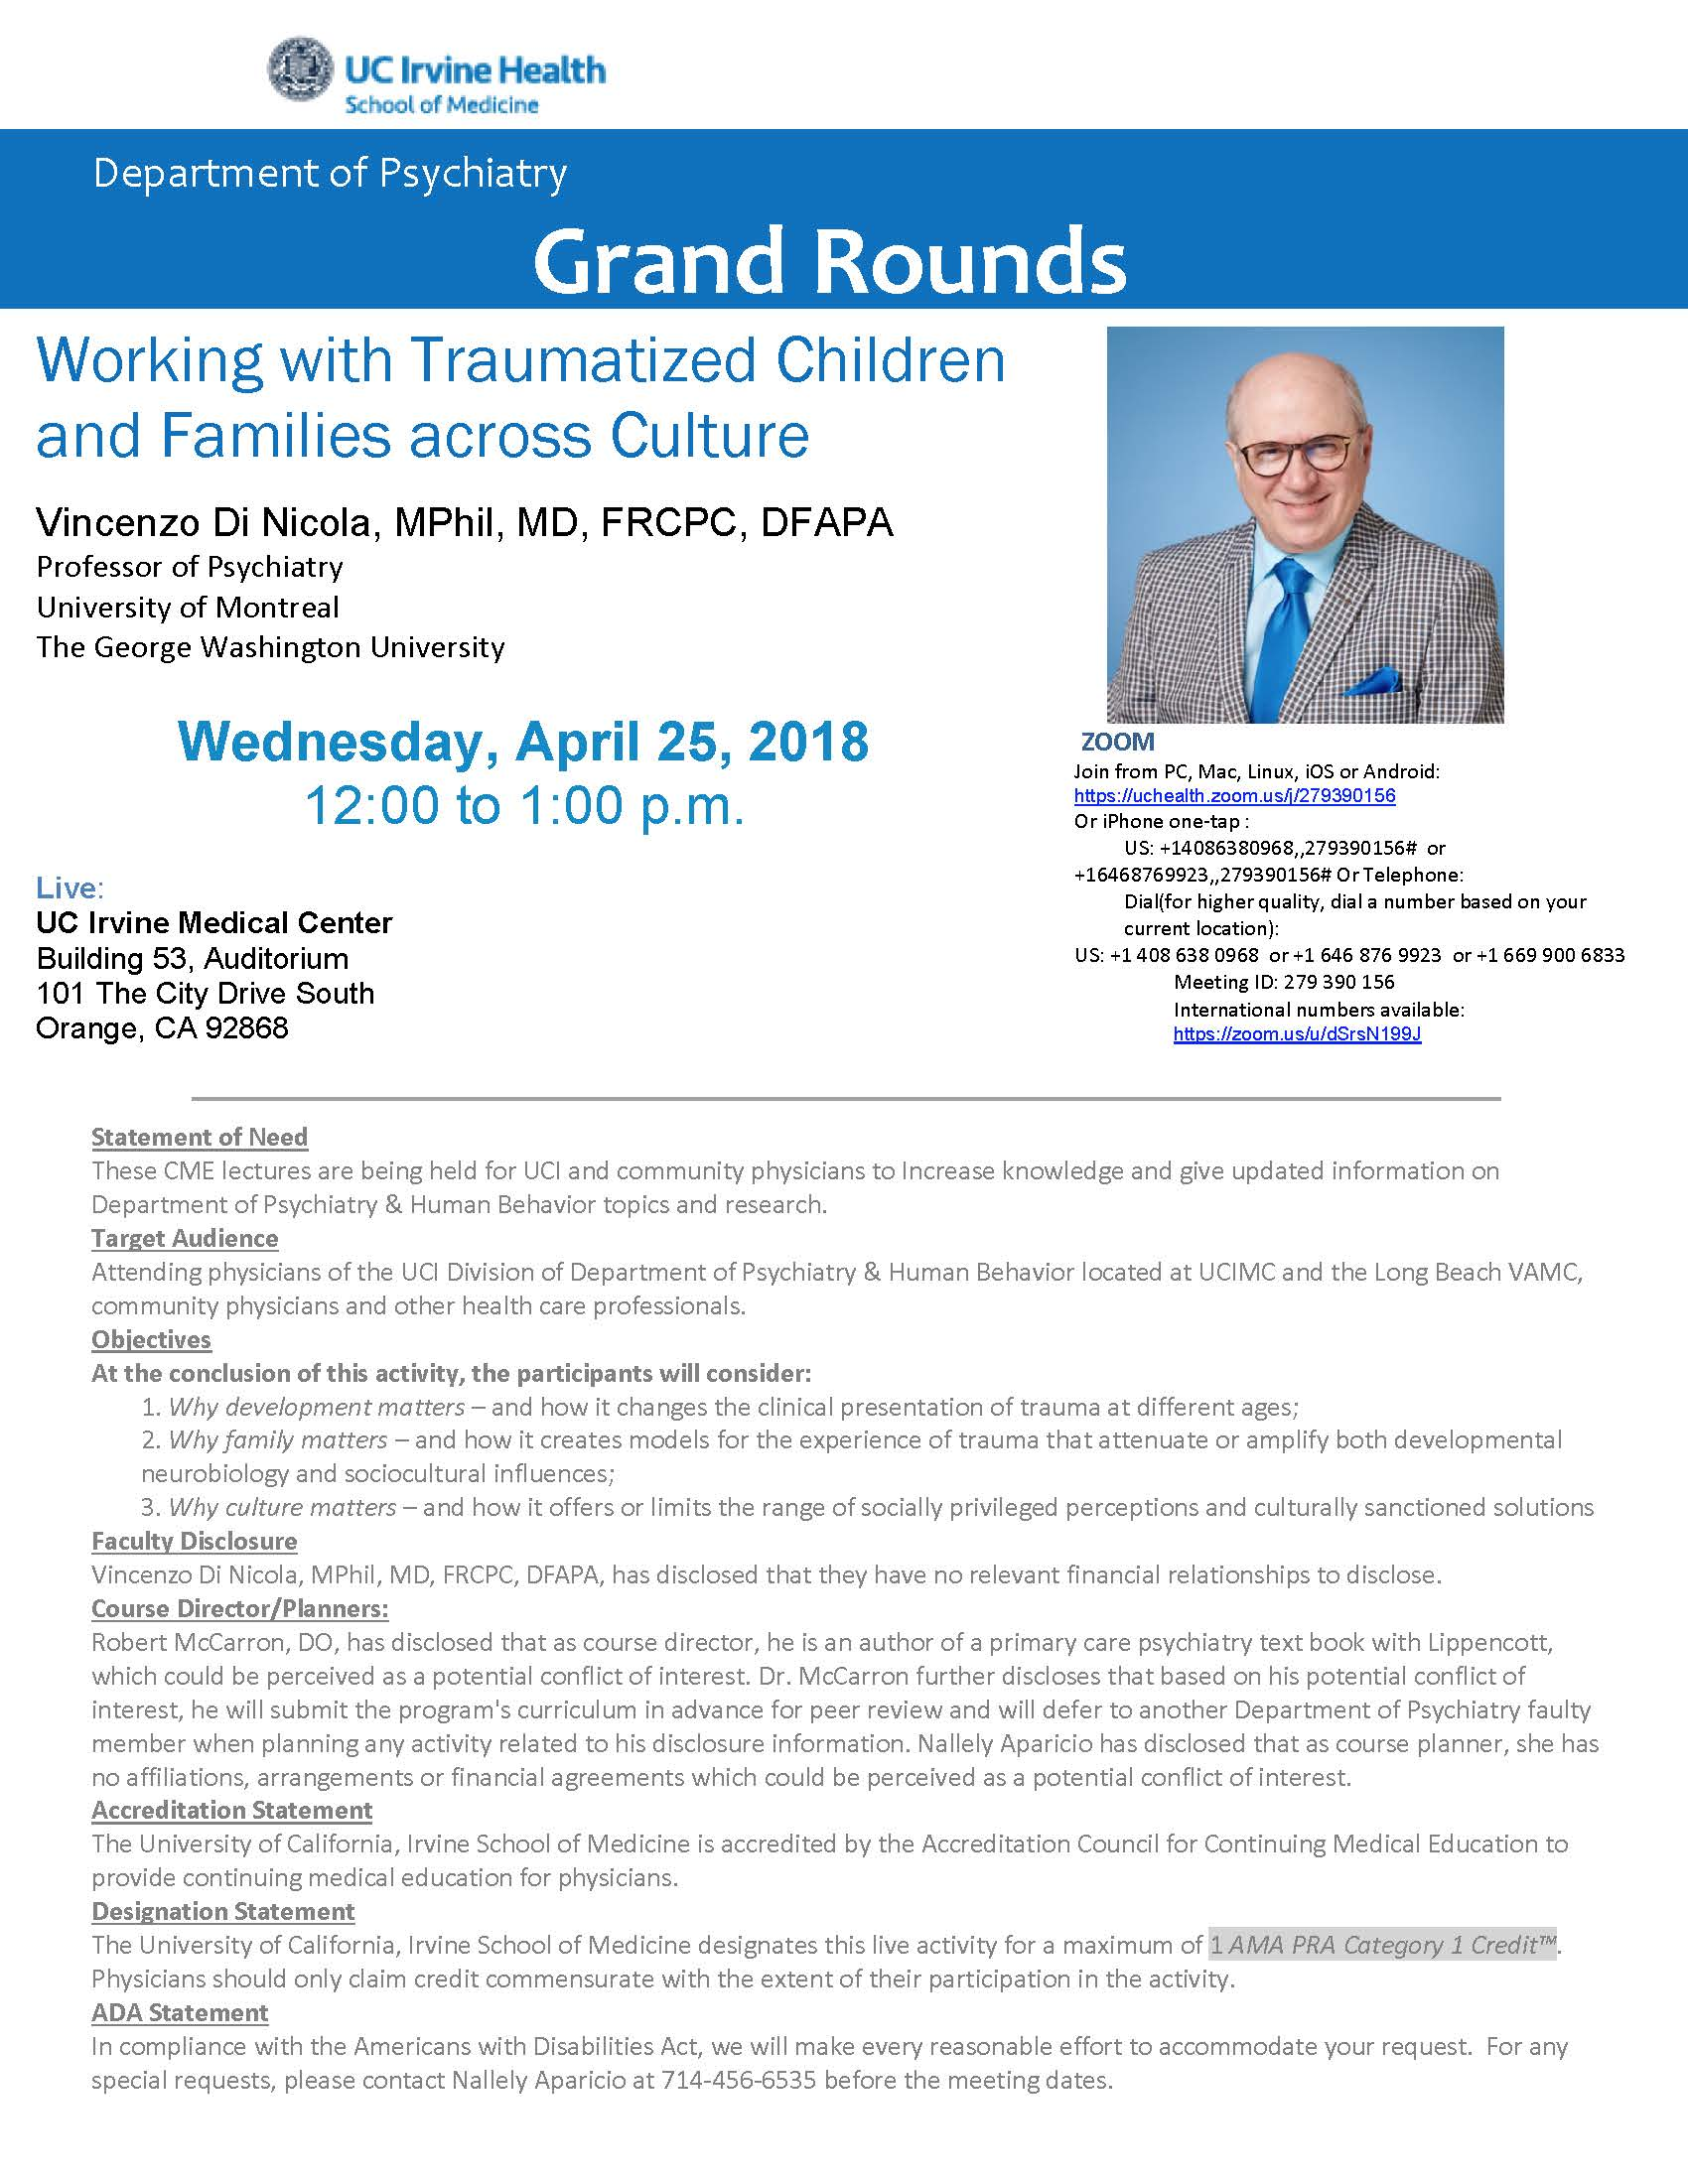 Psychiatric Grand Rounds - University of California-Irvine - 25.04.2018 - Vincenzo Di Nicola